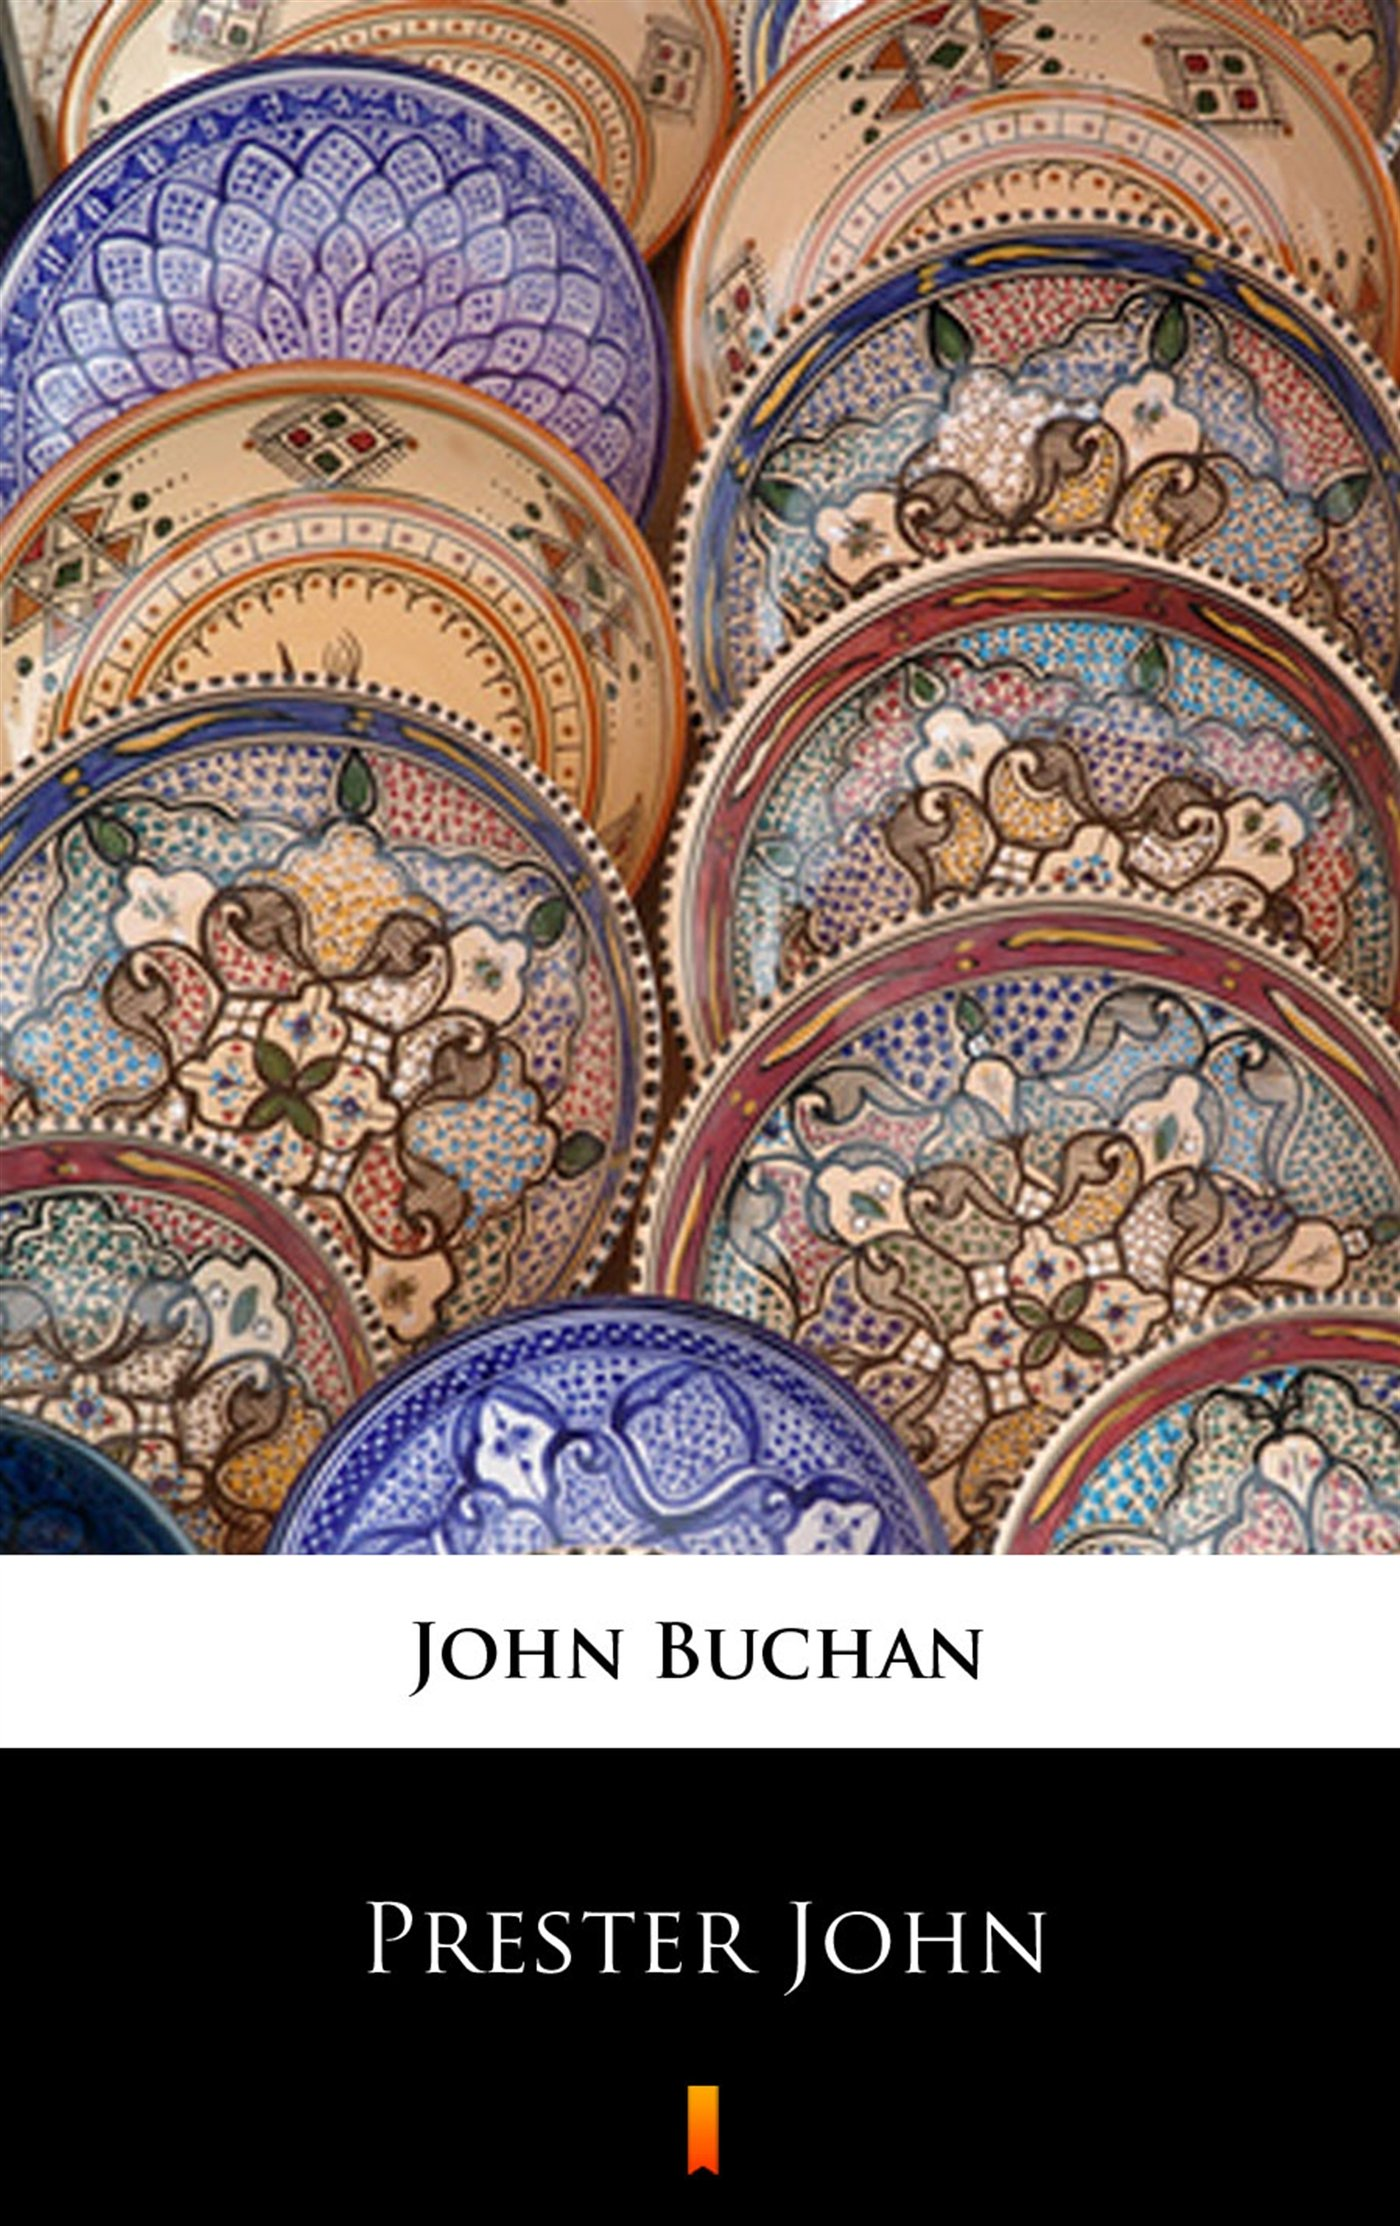 Prester John - Ebook (Książka EPUB) do pobrania w formacie EPUB